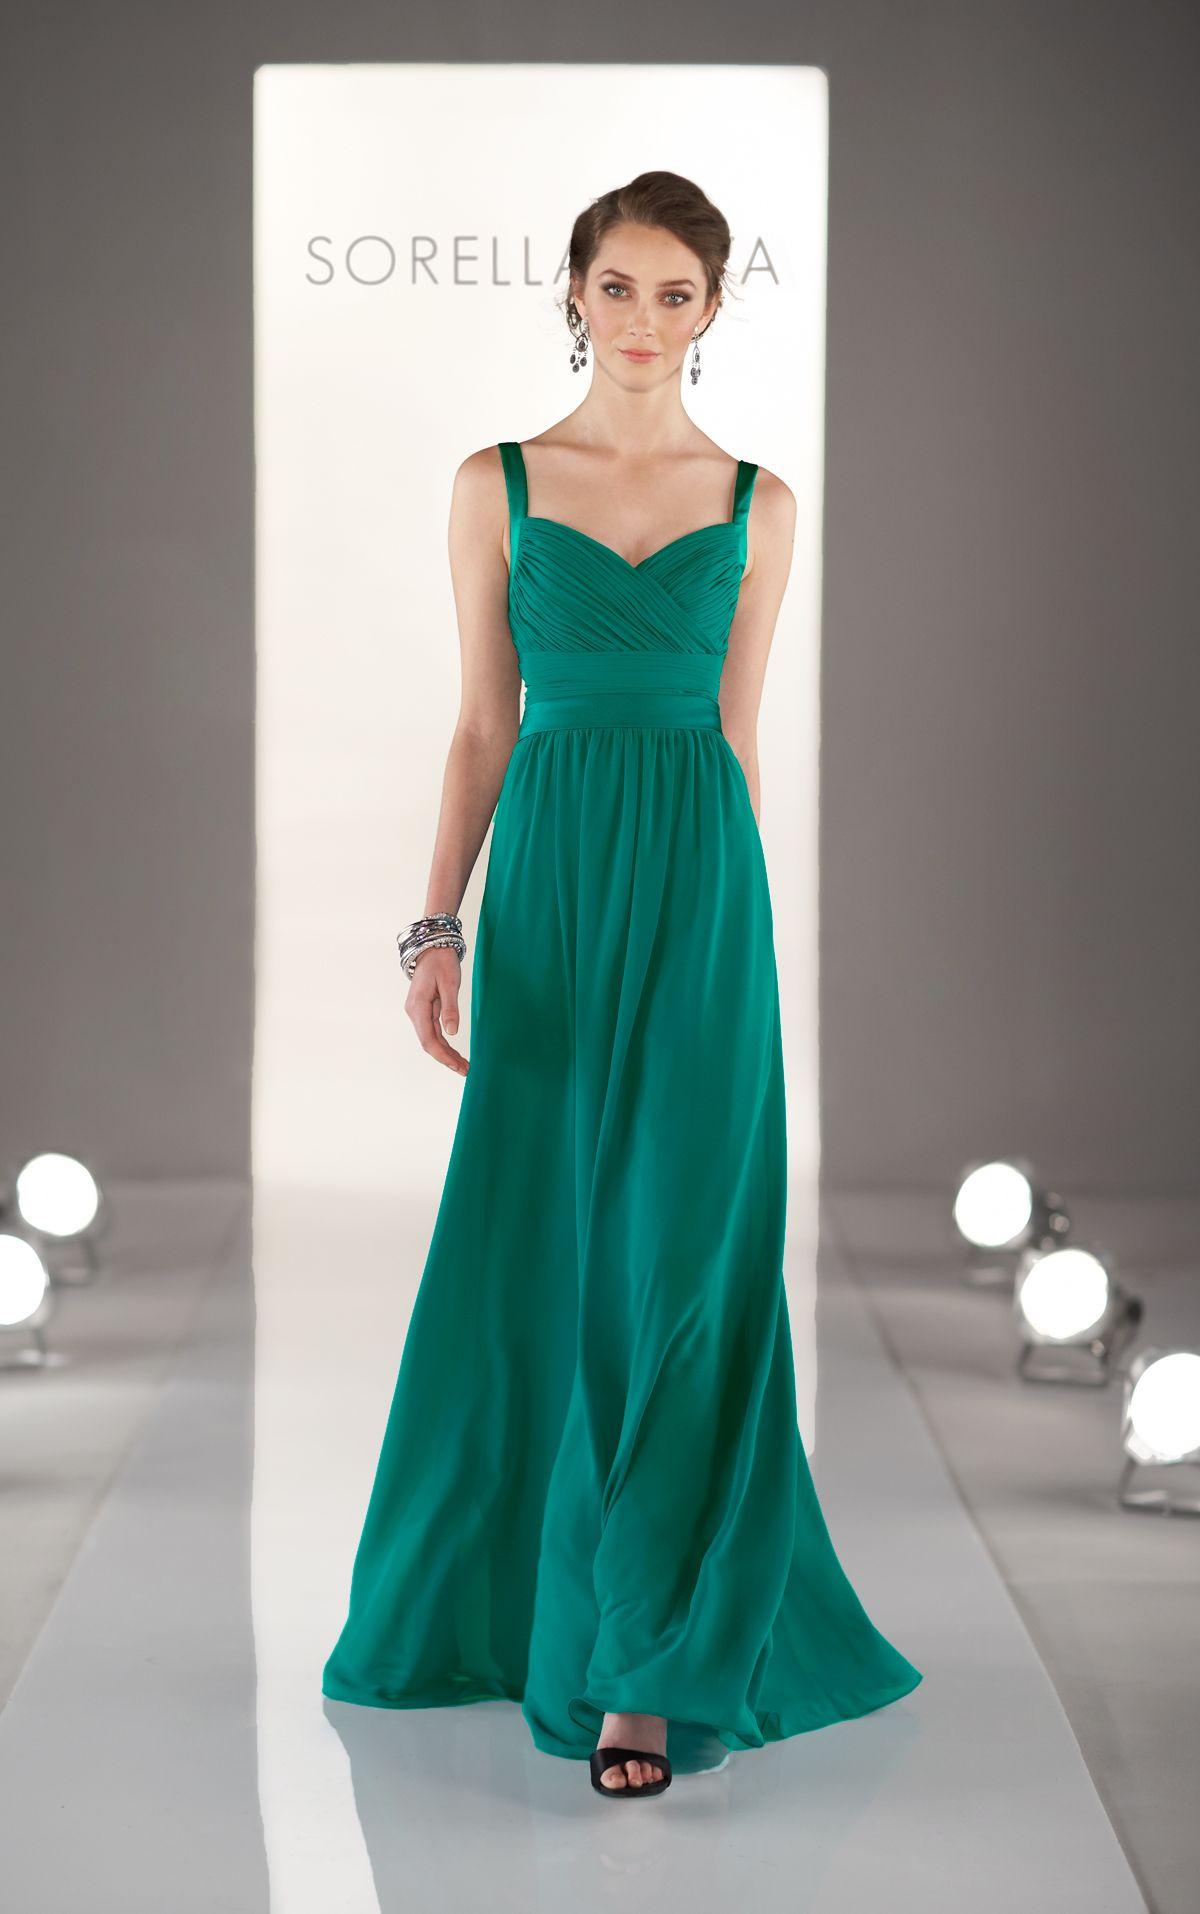 Sorella Vita 8380 Zoom | Katy\'s wedding | Pinterest | Mint green ...